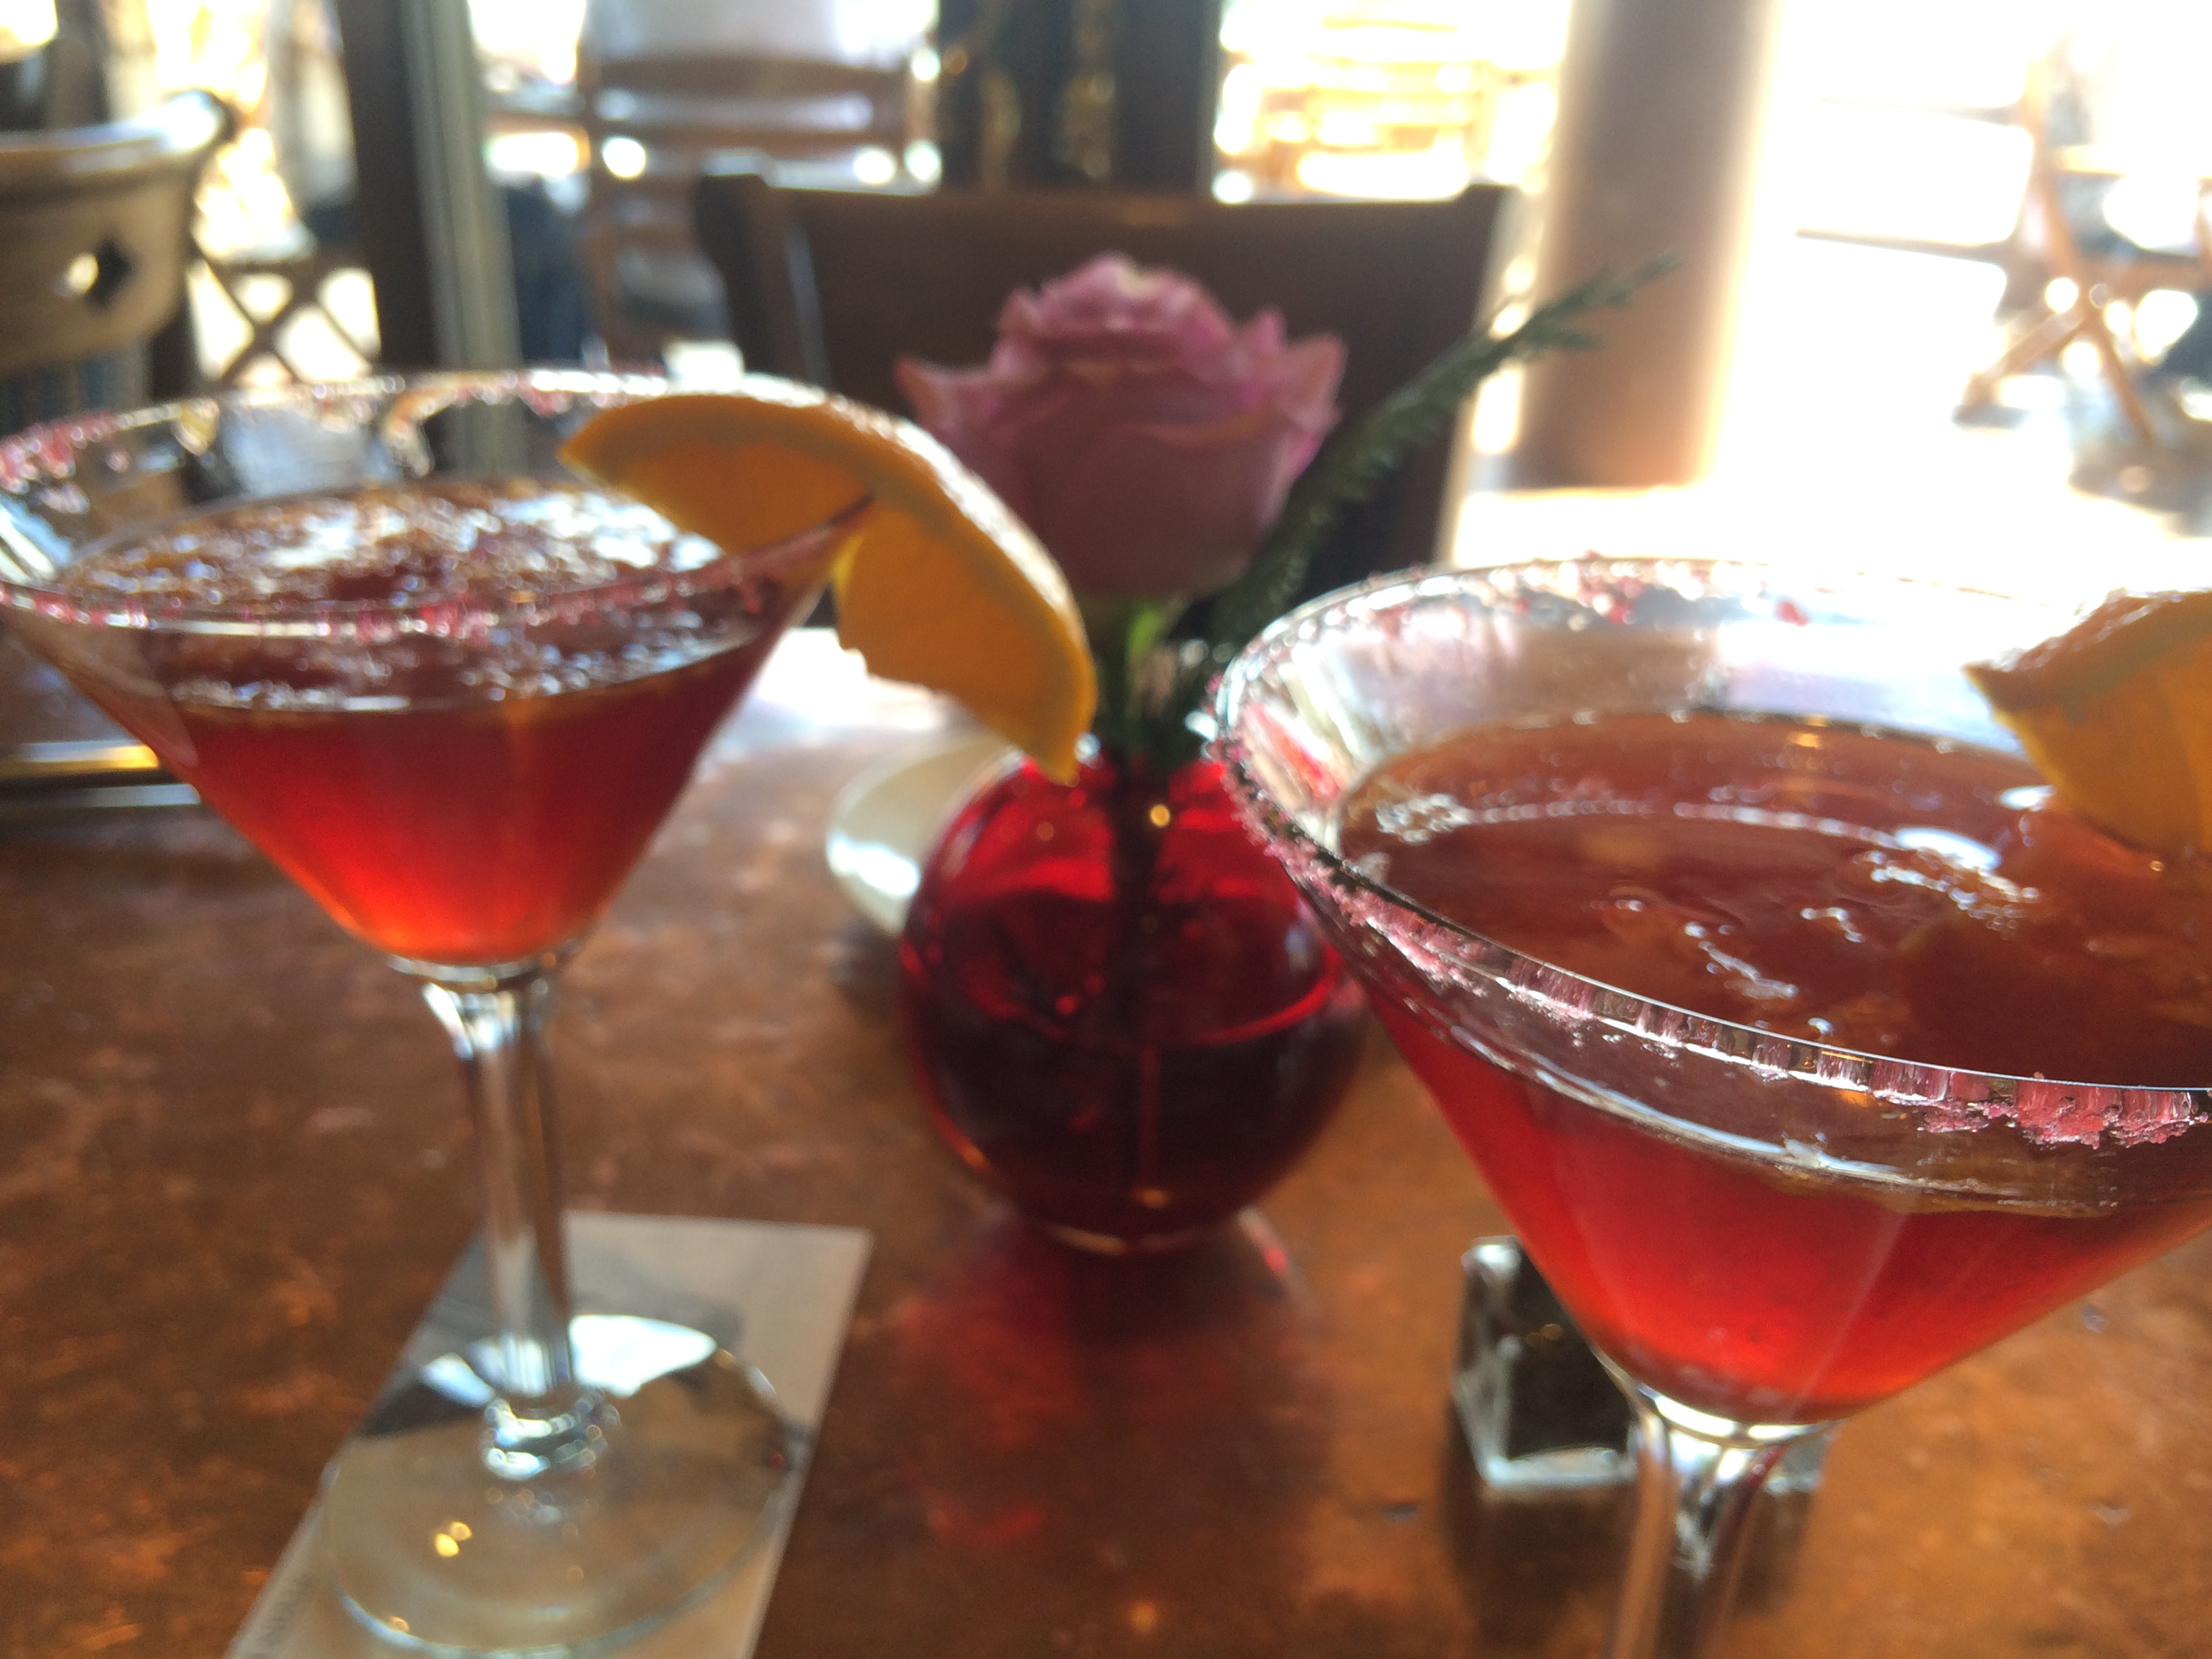 Stein Eriksen Lodge Deer Valley Ski Resort Martini Wine Glass and Roses